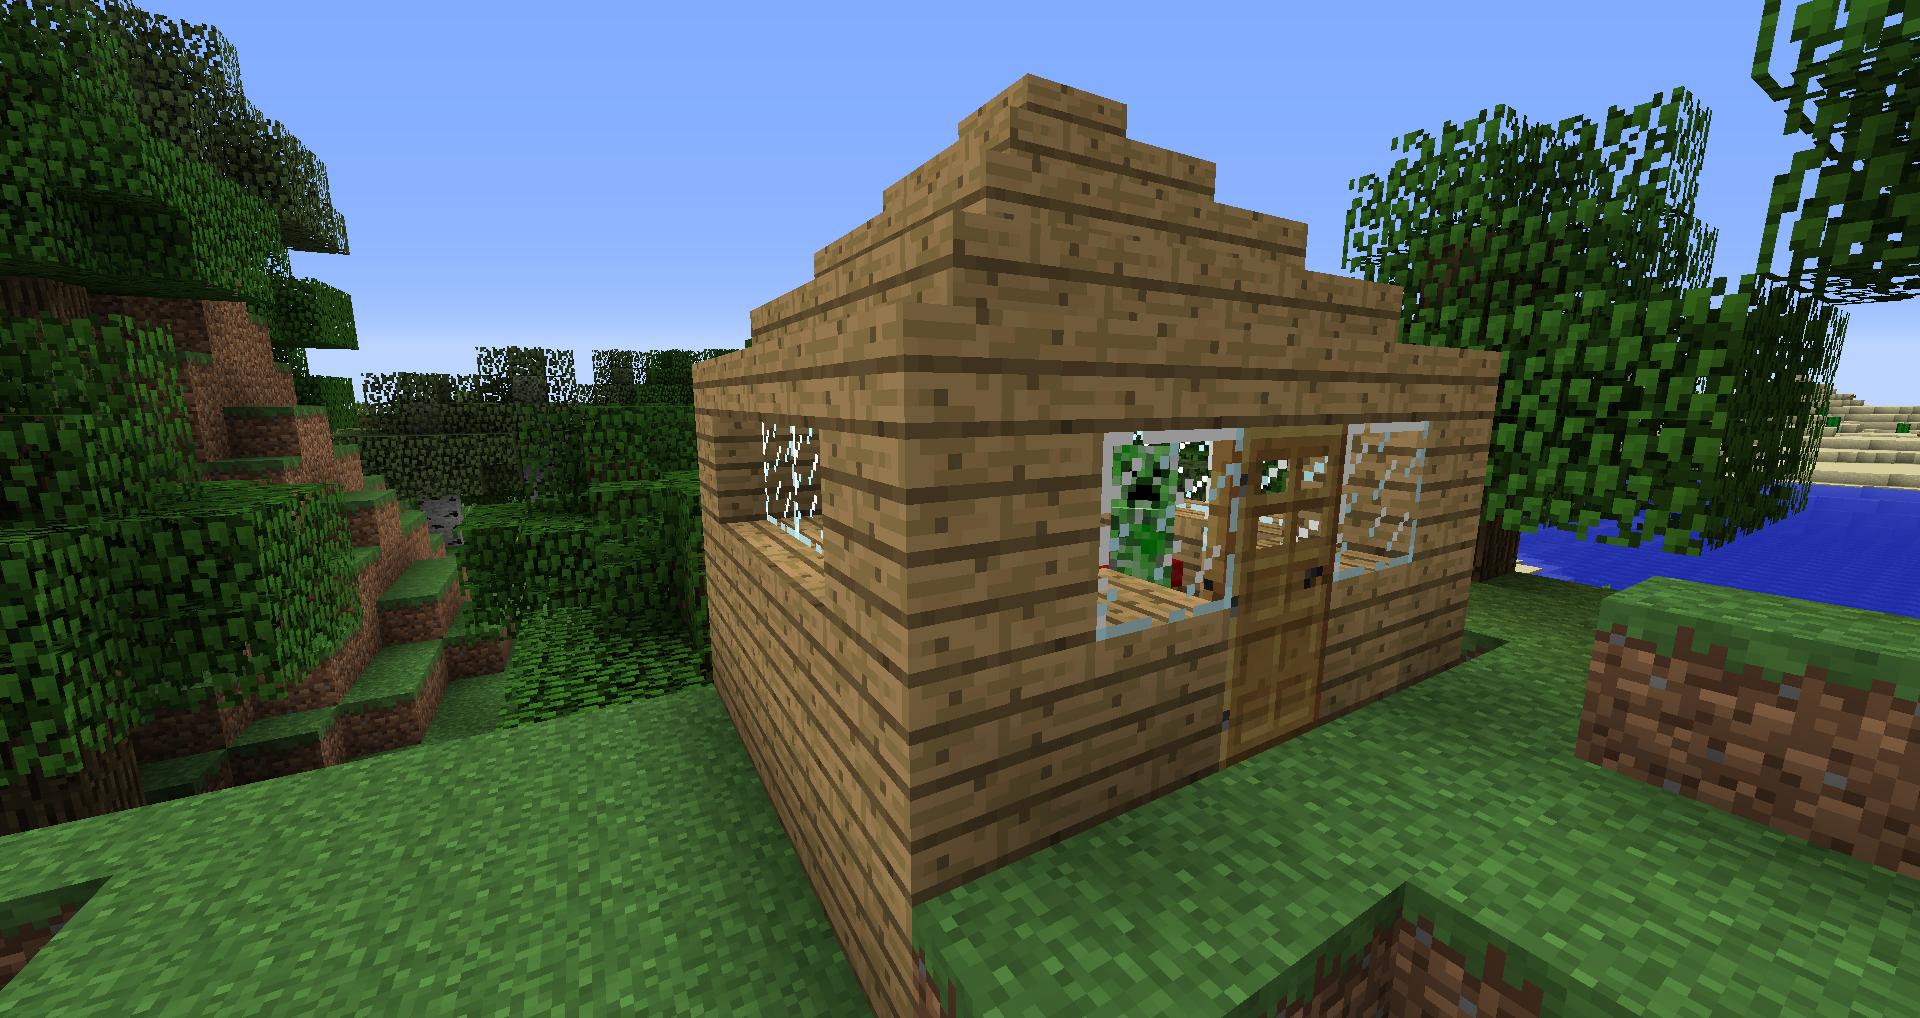 Invsi Zones Mod Download Planeta Minecraft - Minecraft house download 1 7 10